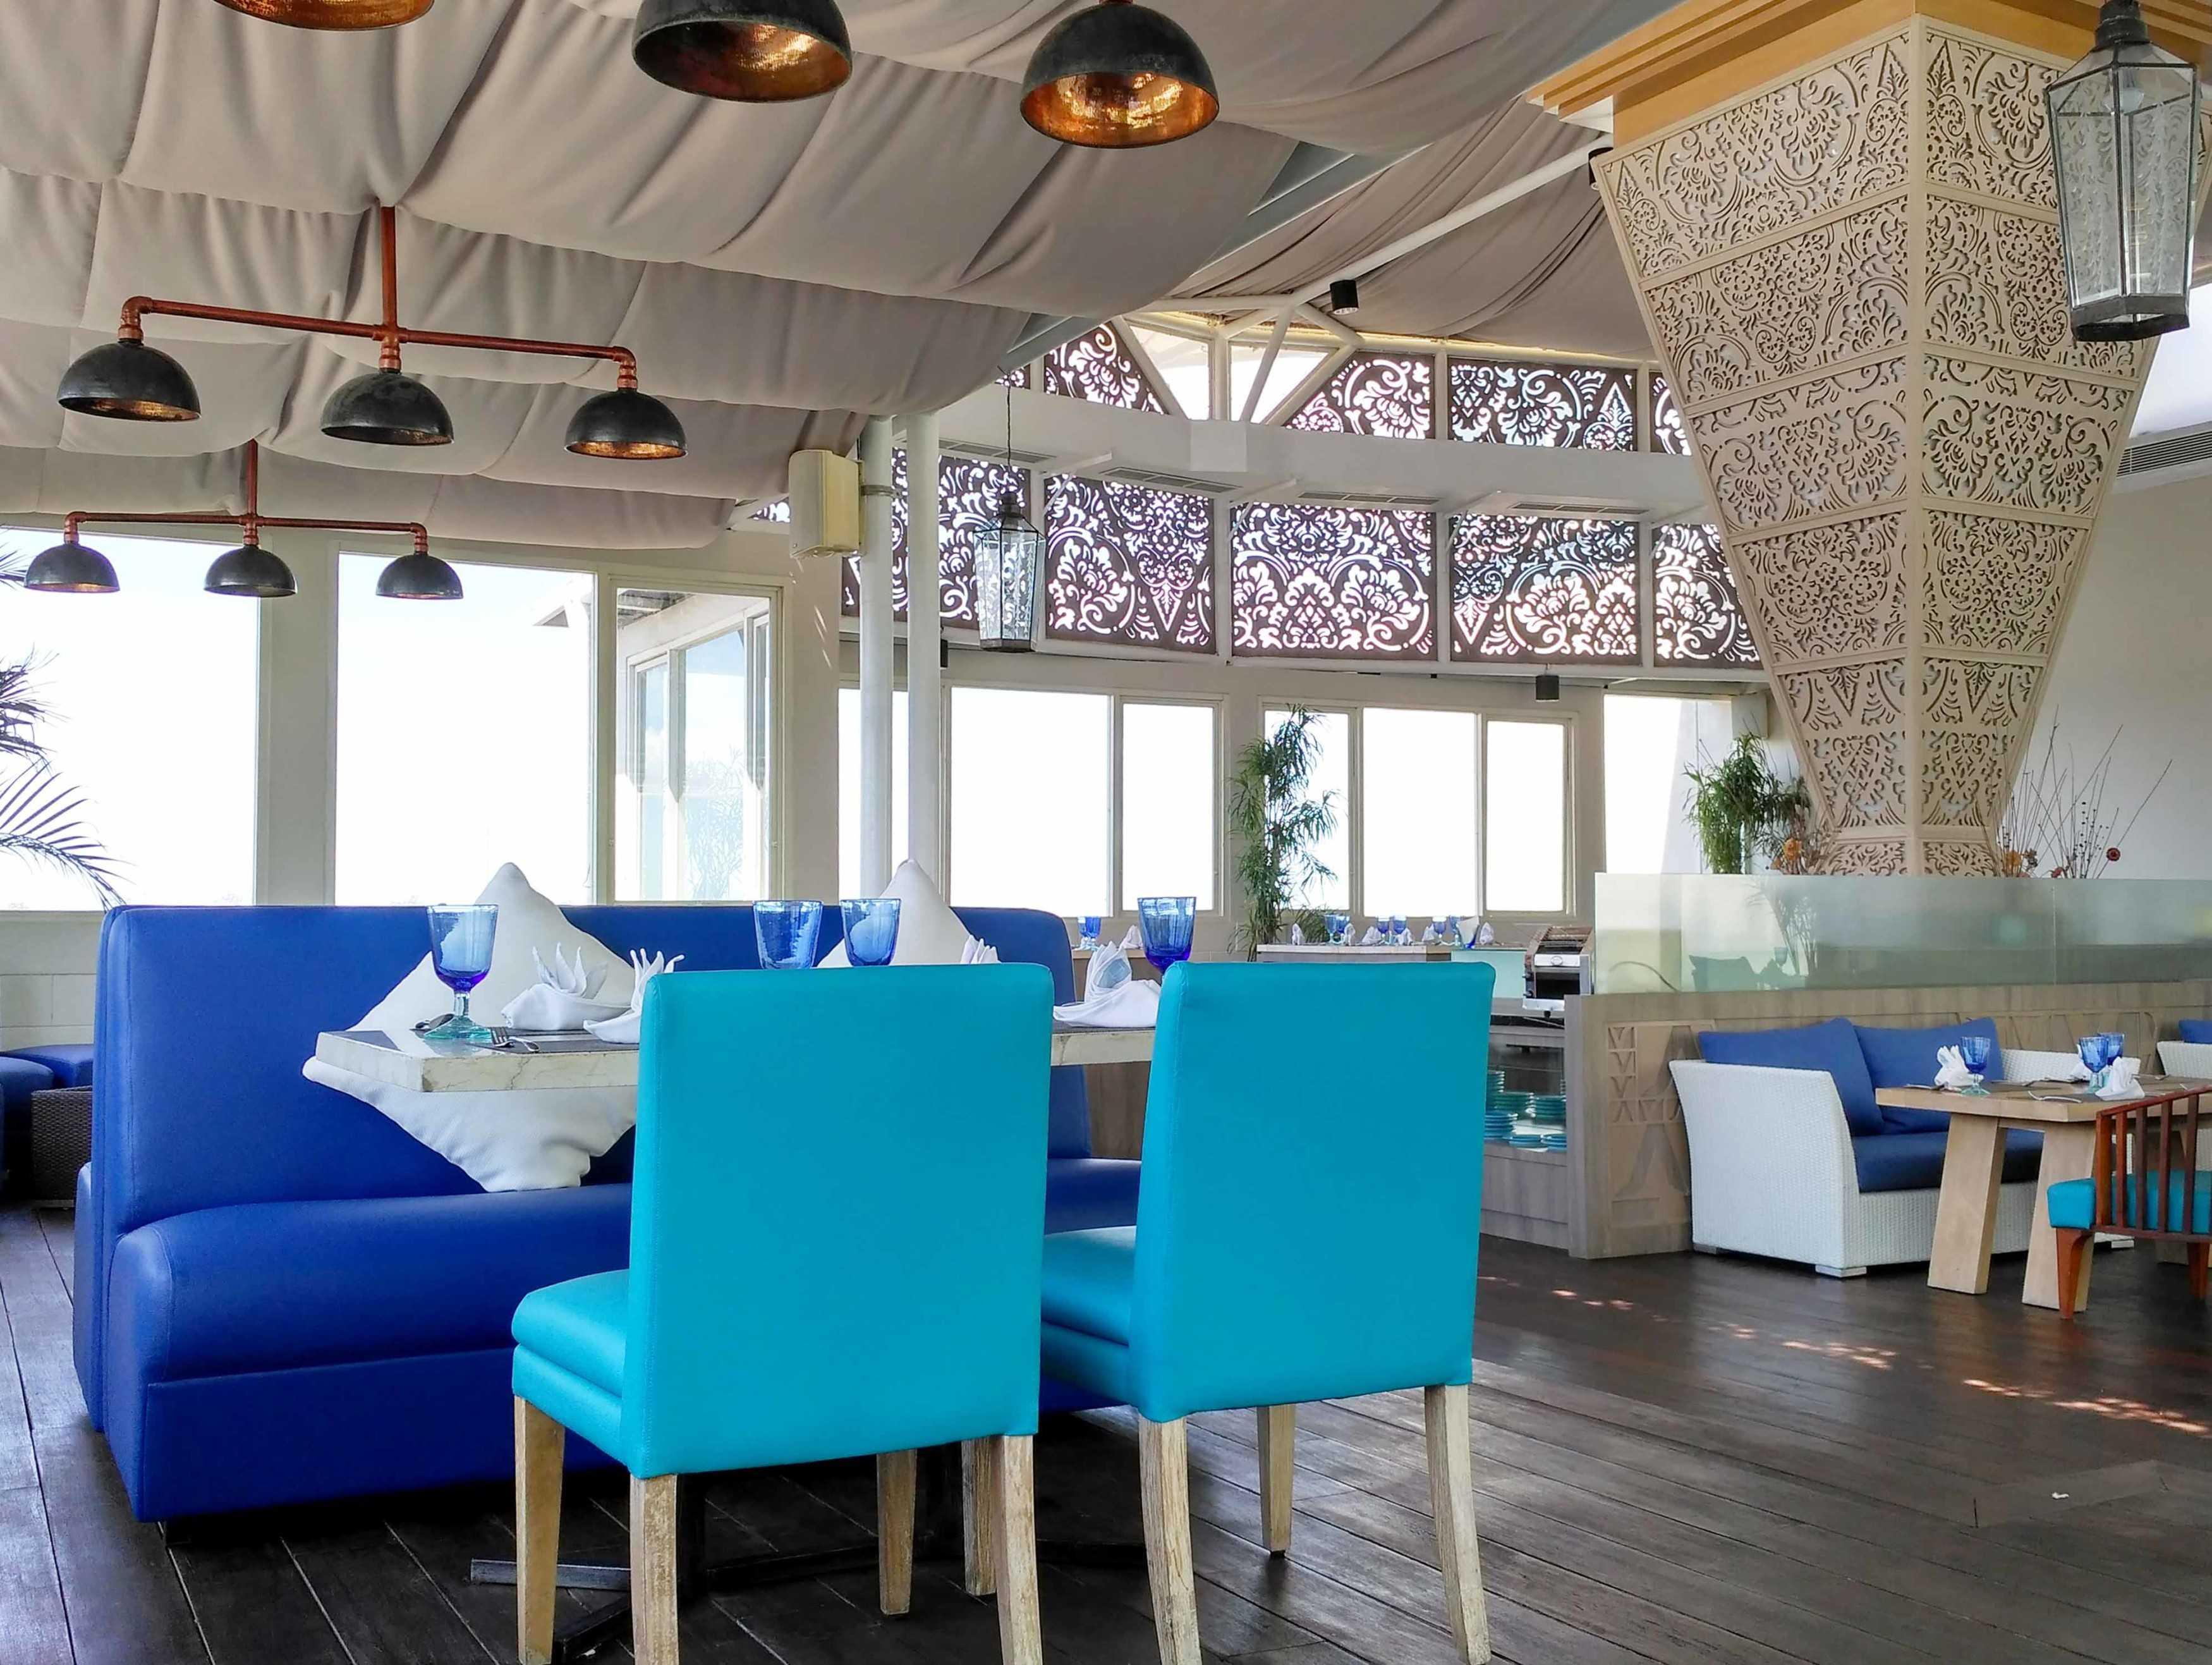 Monokroma Architect Golden Tulip Devinz Skyvilla Seminyak, Bali Seminyak, Bali Seating Area Interior View Modern  29949